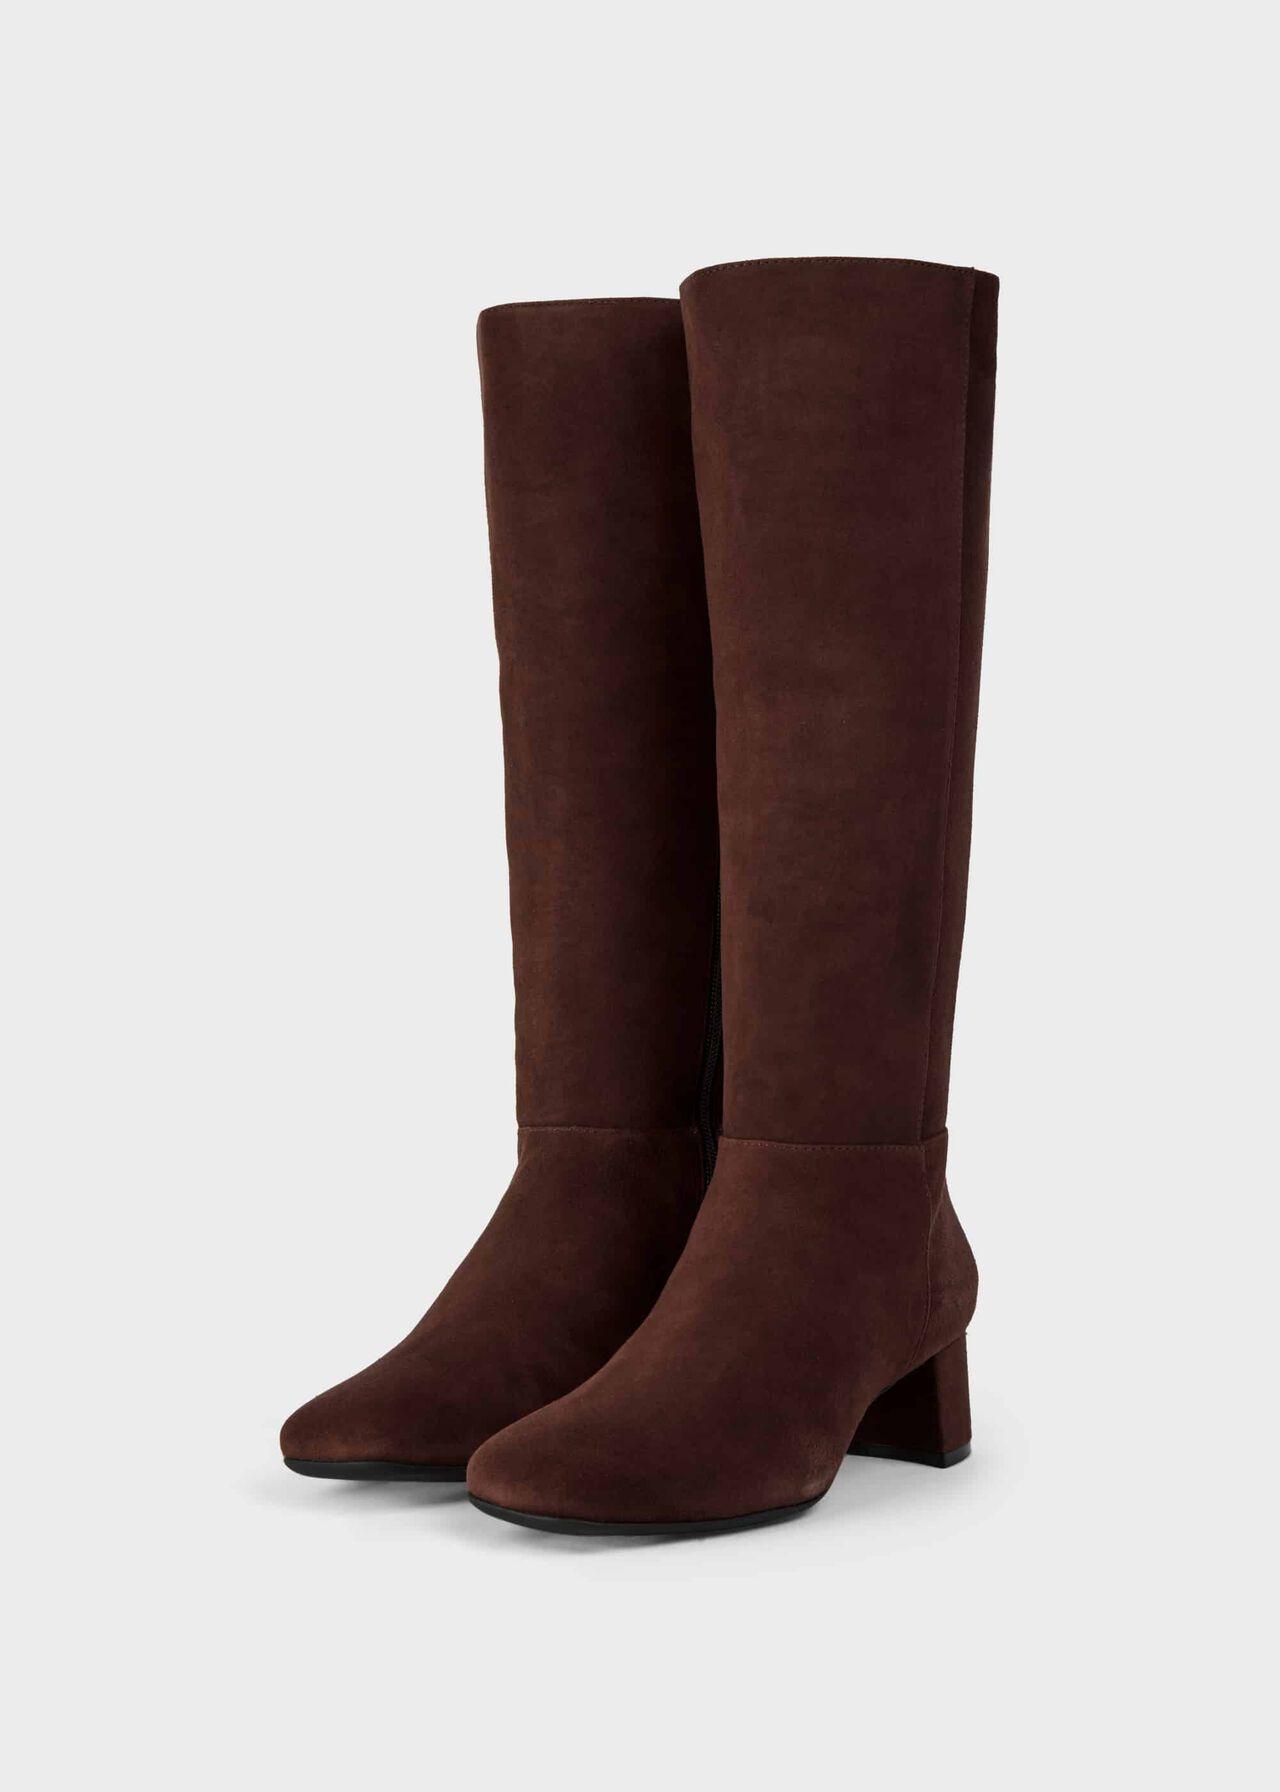 Hailey Flexi Knee Boot Chocolate